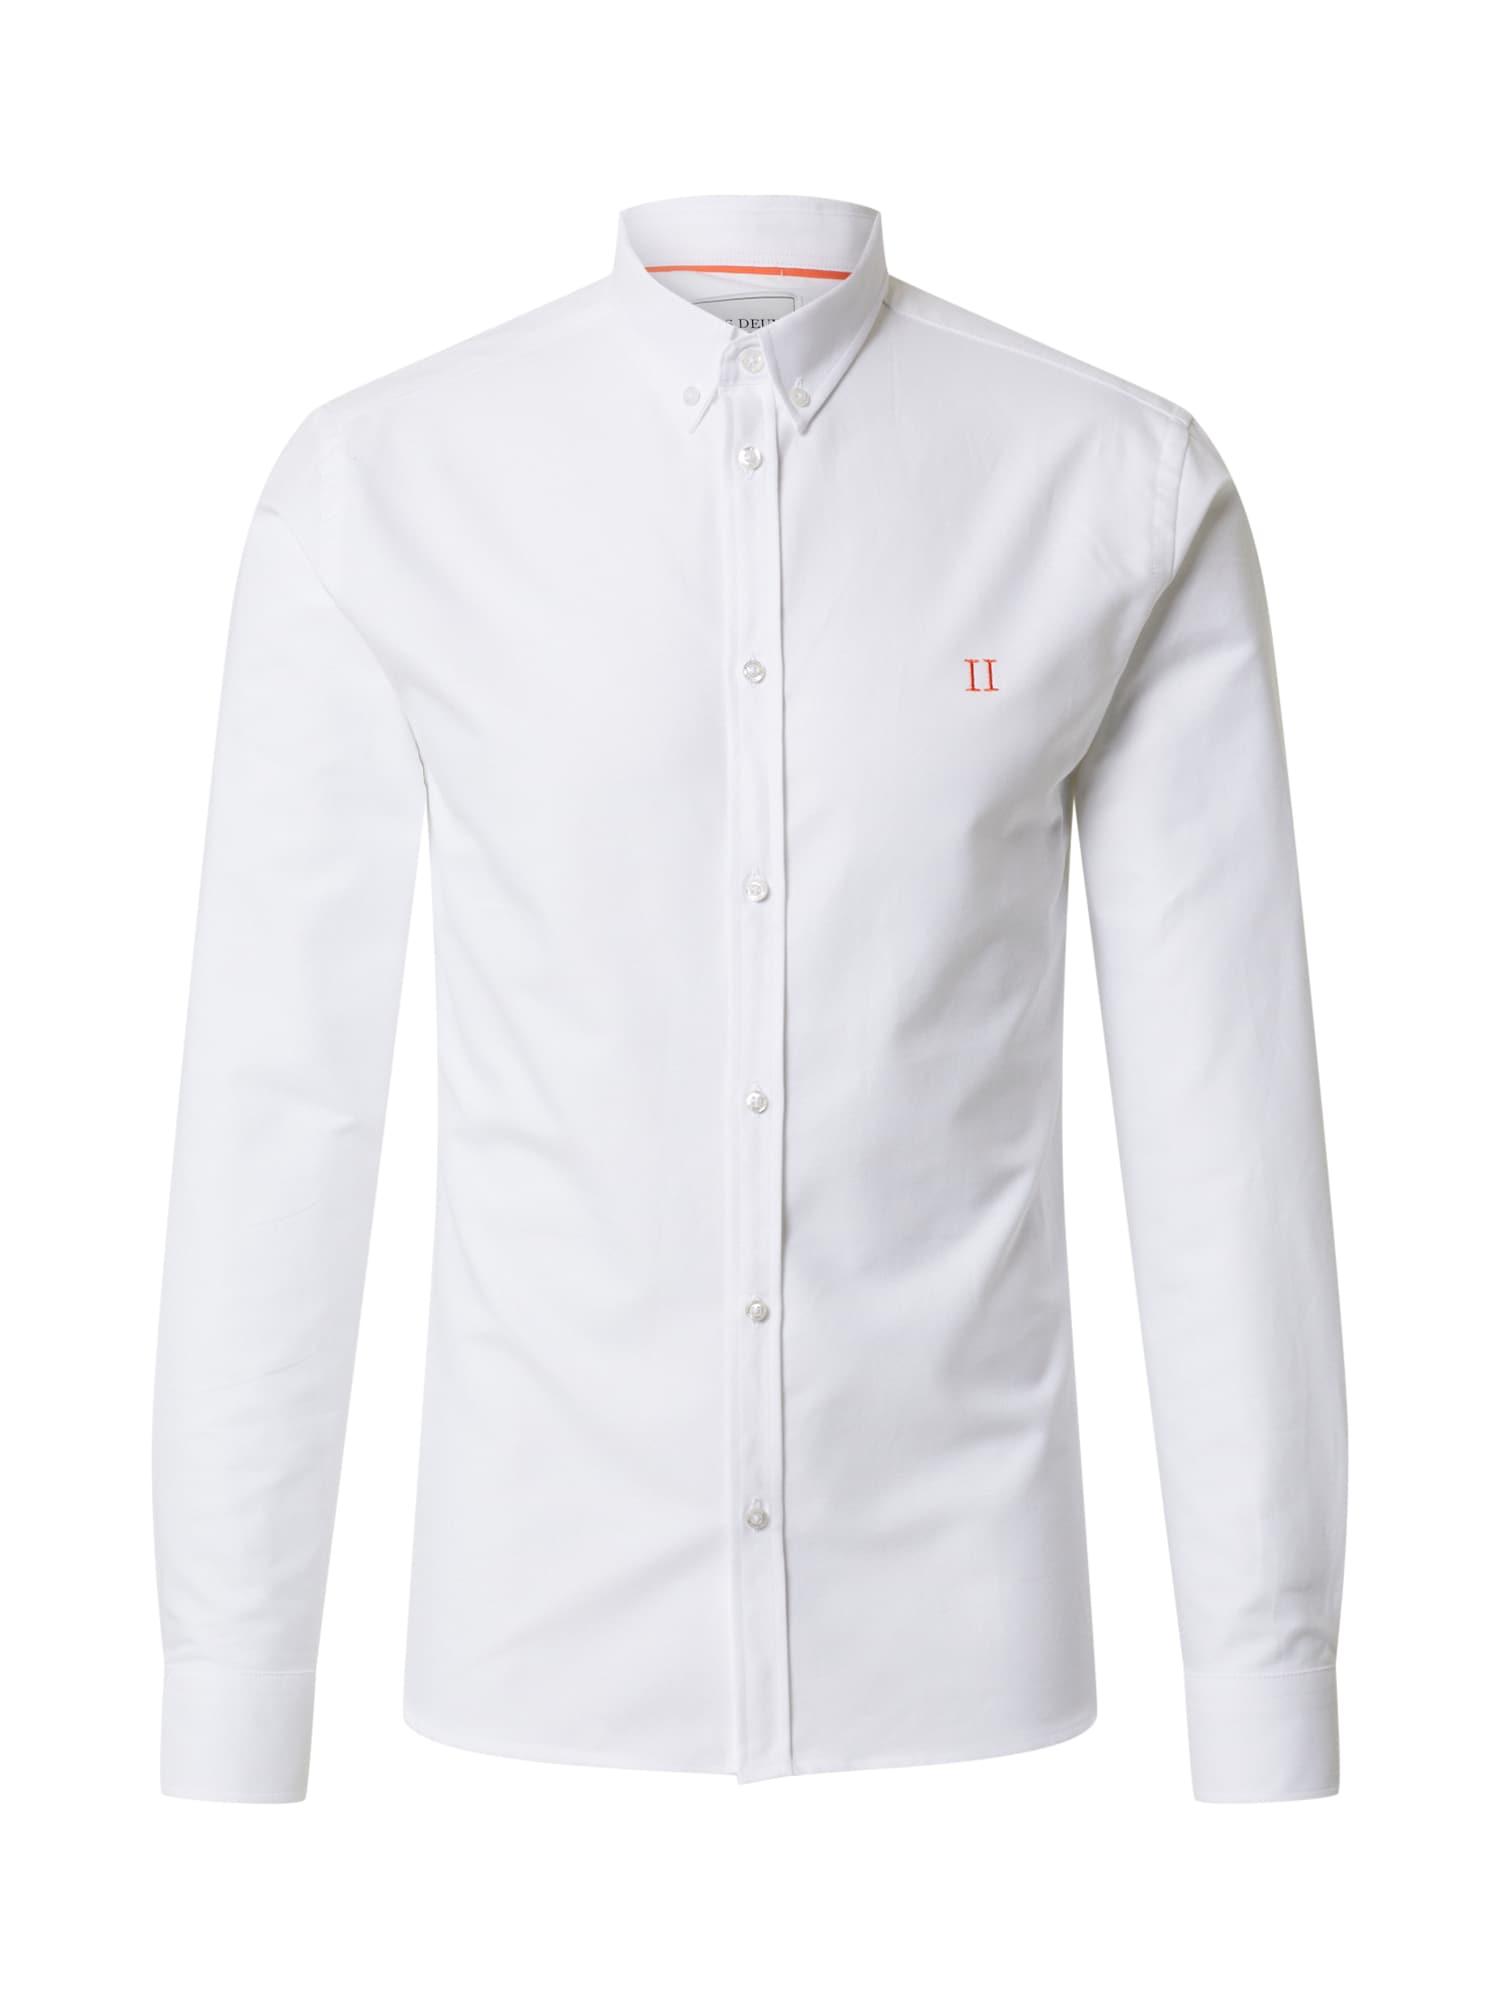 Les Deux Marškiniai